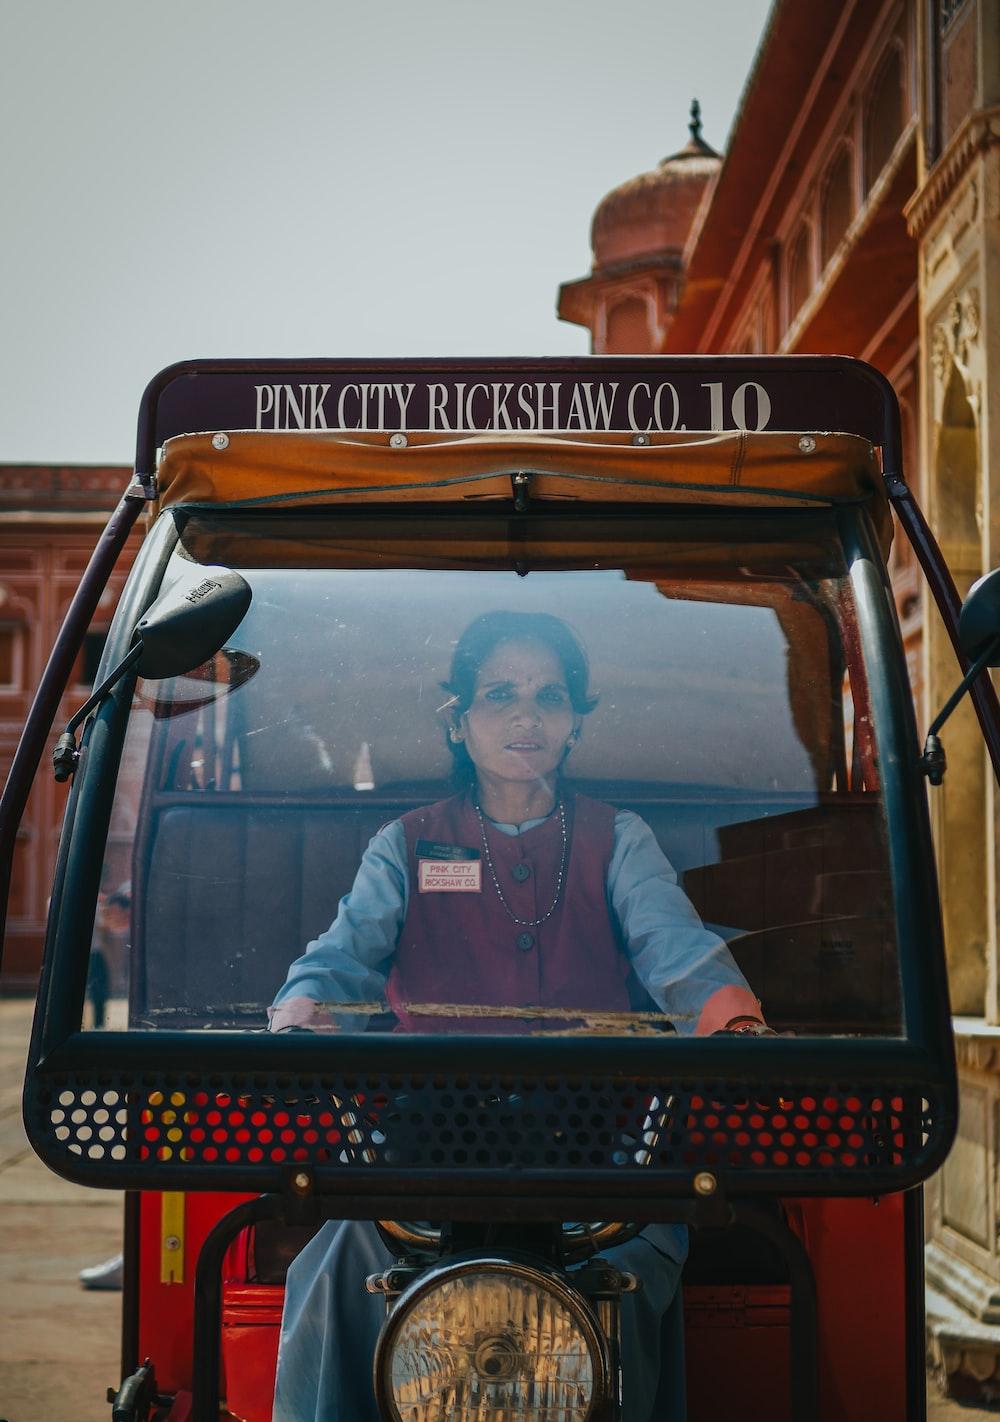 person riding auto rickshaw during daytime